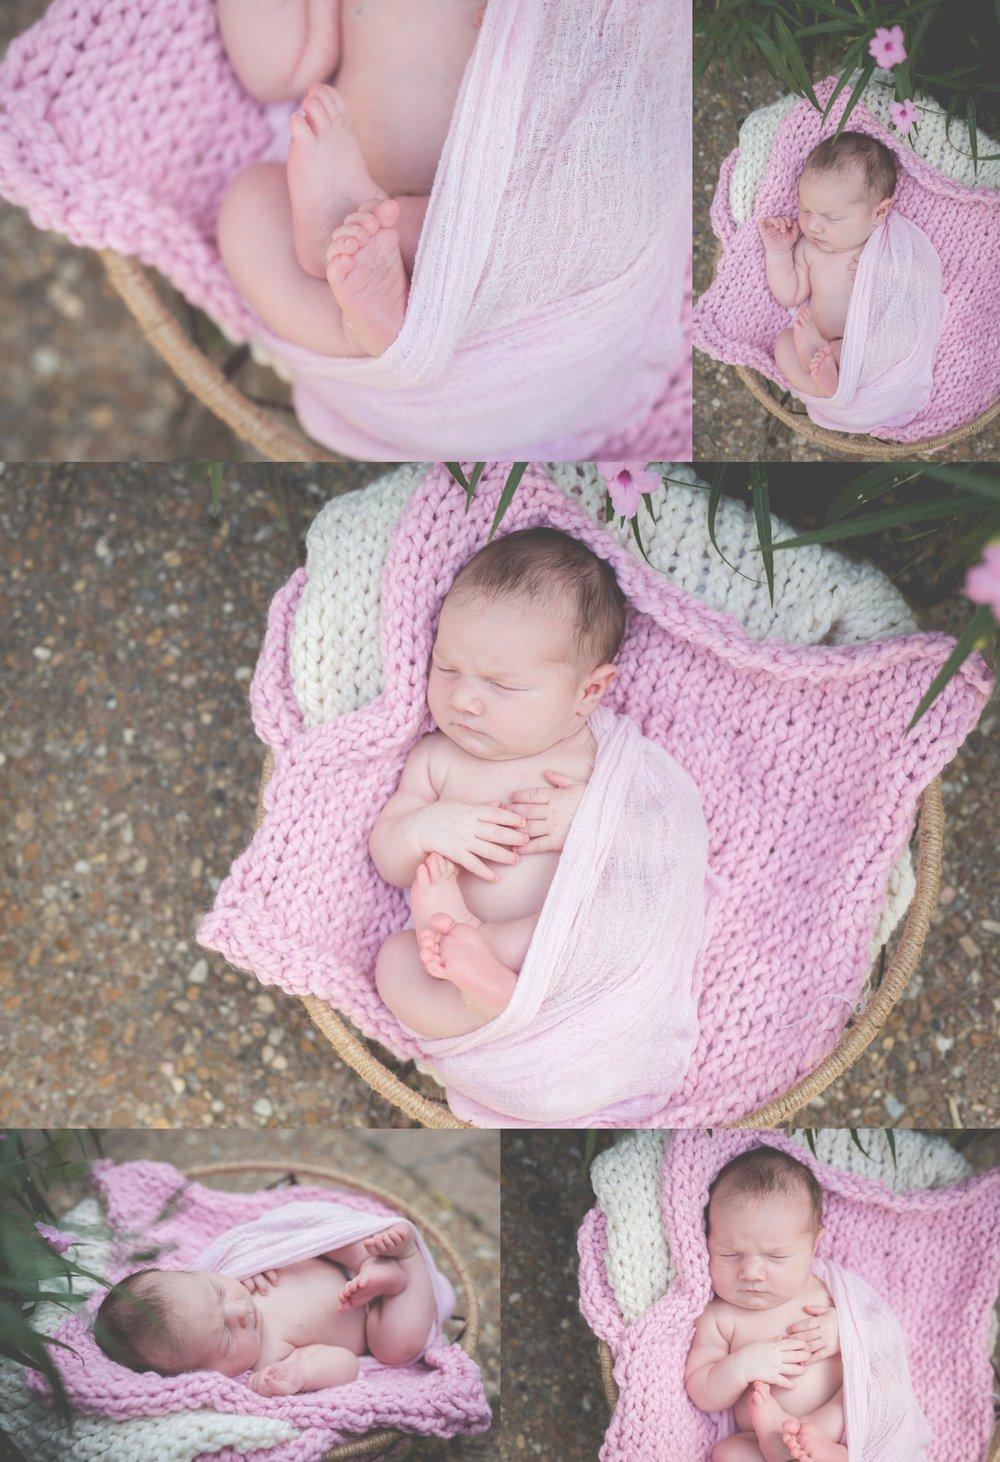 2017-01-25-aria-newborn-baby-girl-pink-camdenton-missouri-lake-ozarks-photographer.jpg